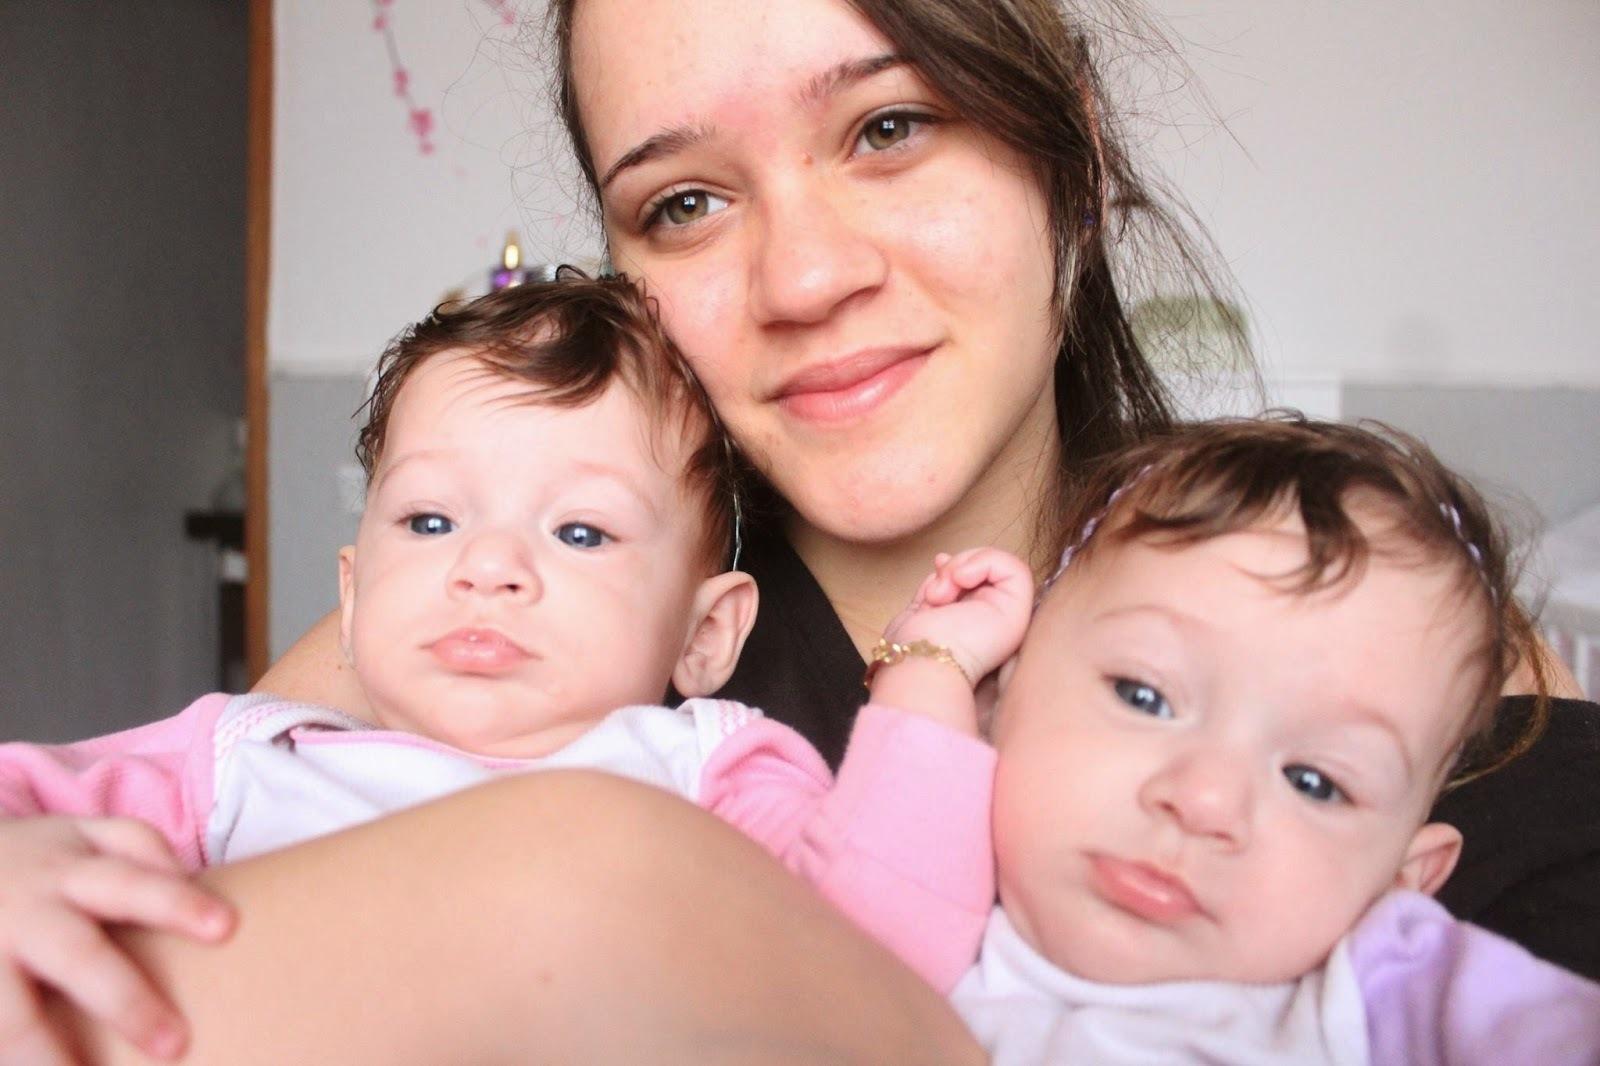 Minha filha Rafaela vai voar - Sobre ser avó